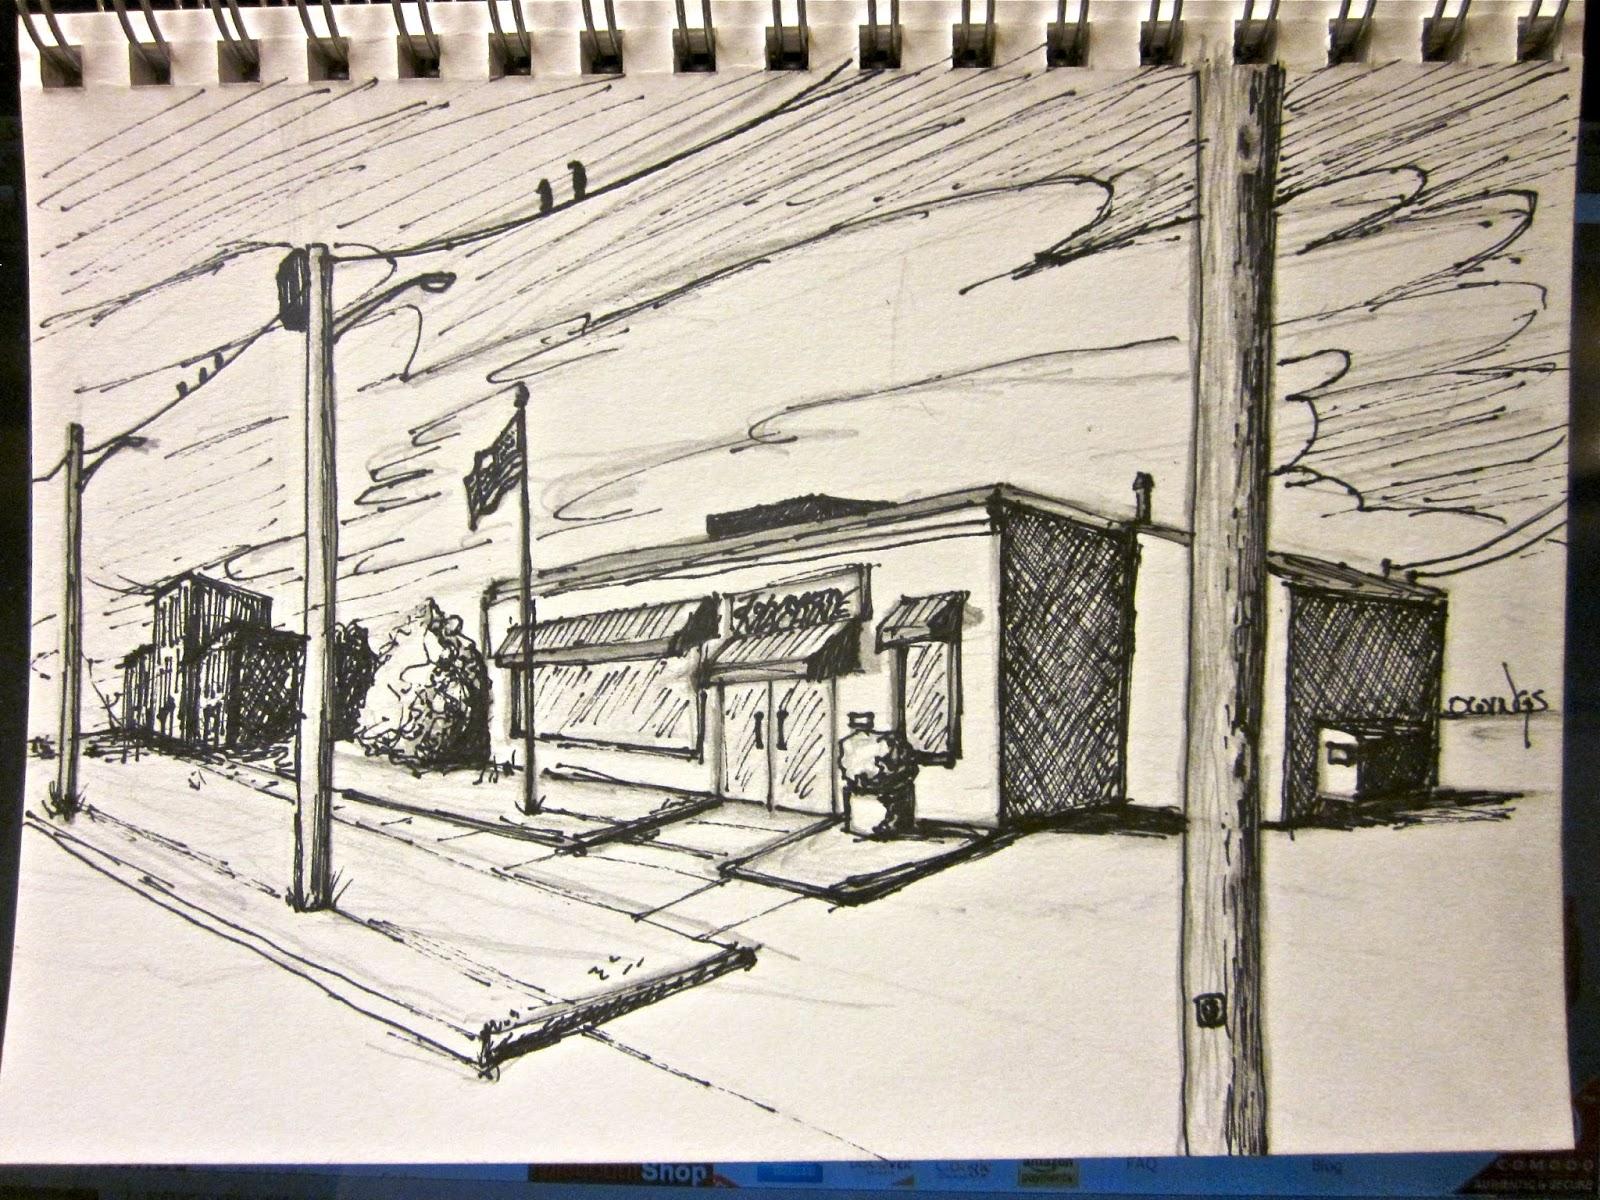 1600x1200 Owings Art Studio Storefront Drawing